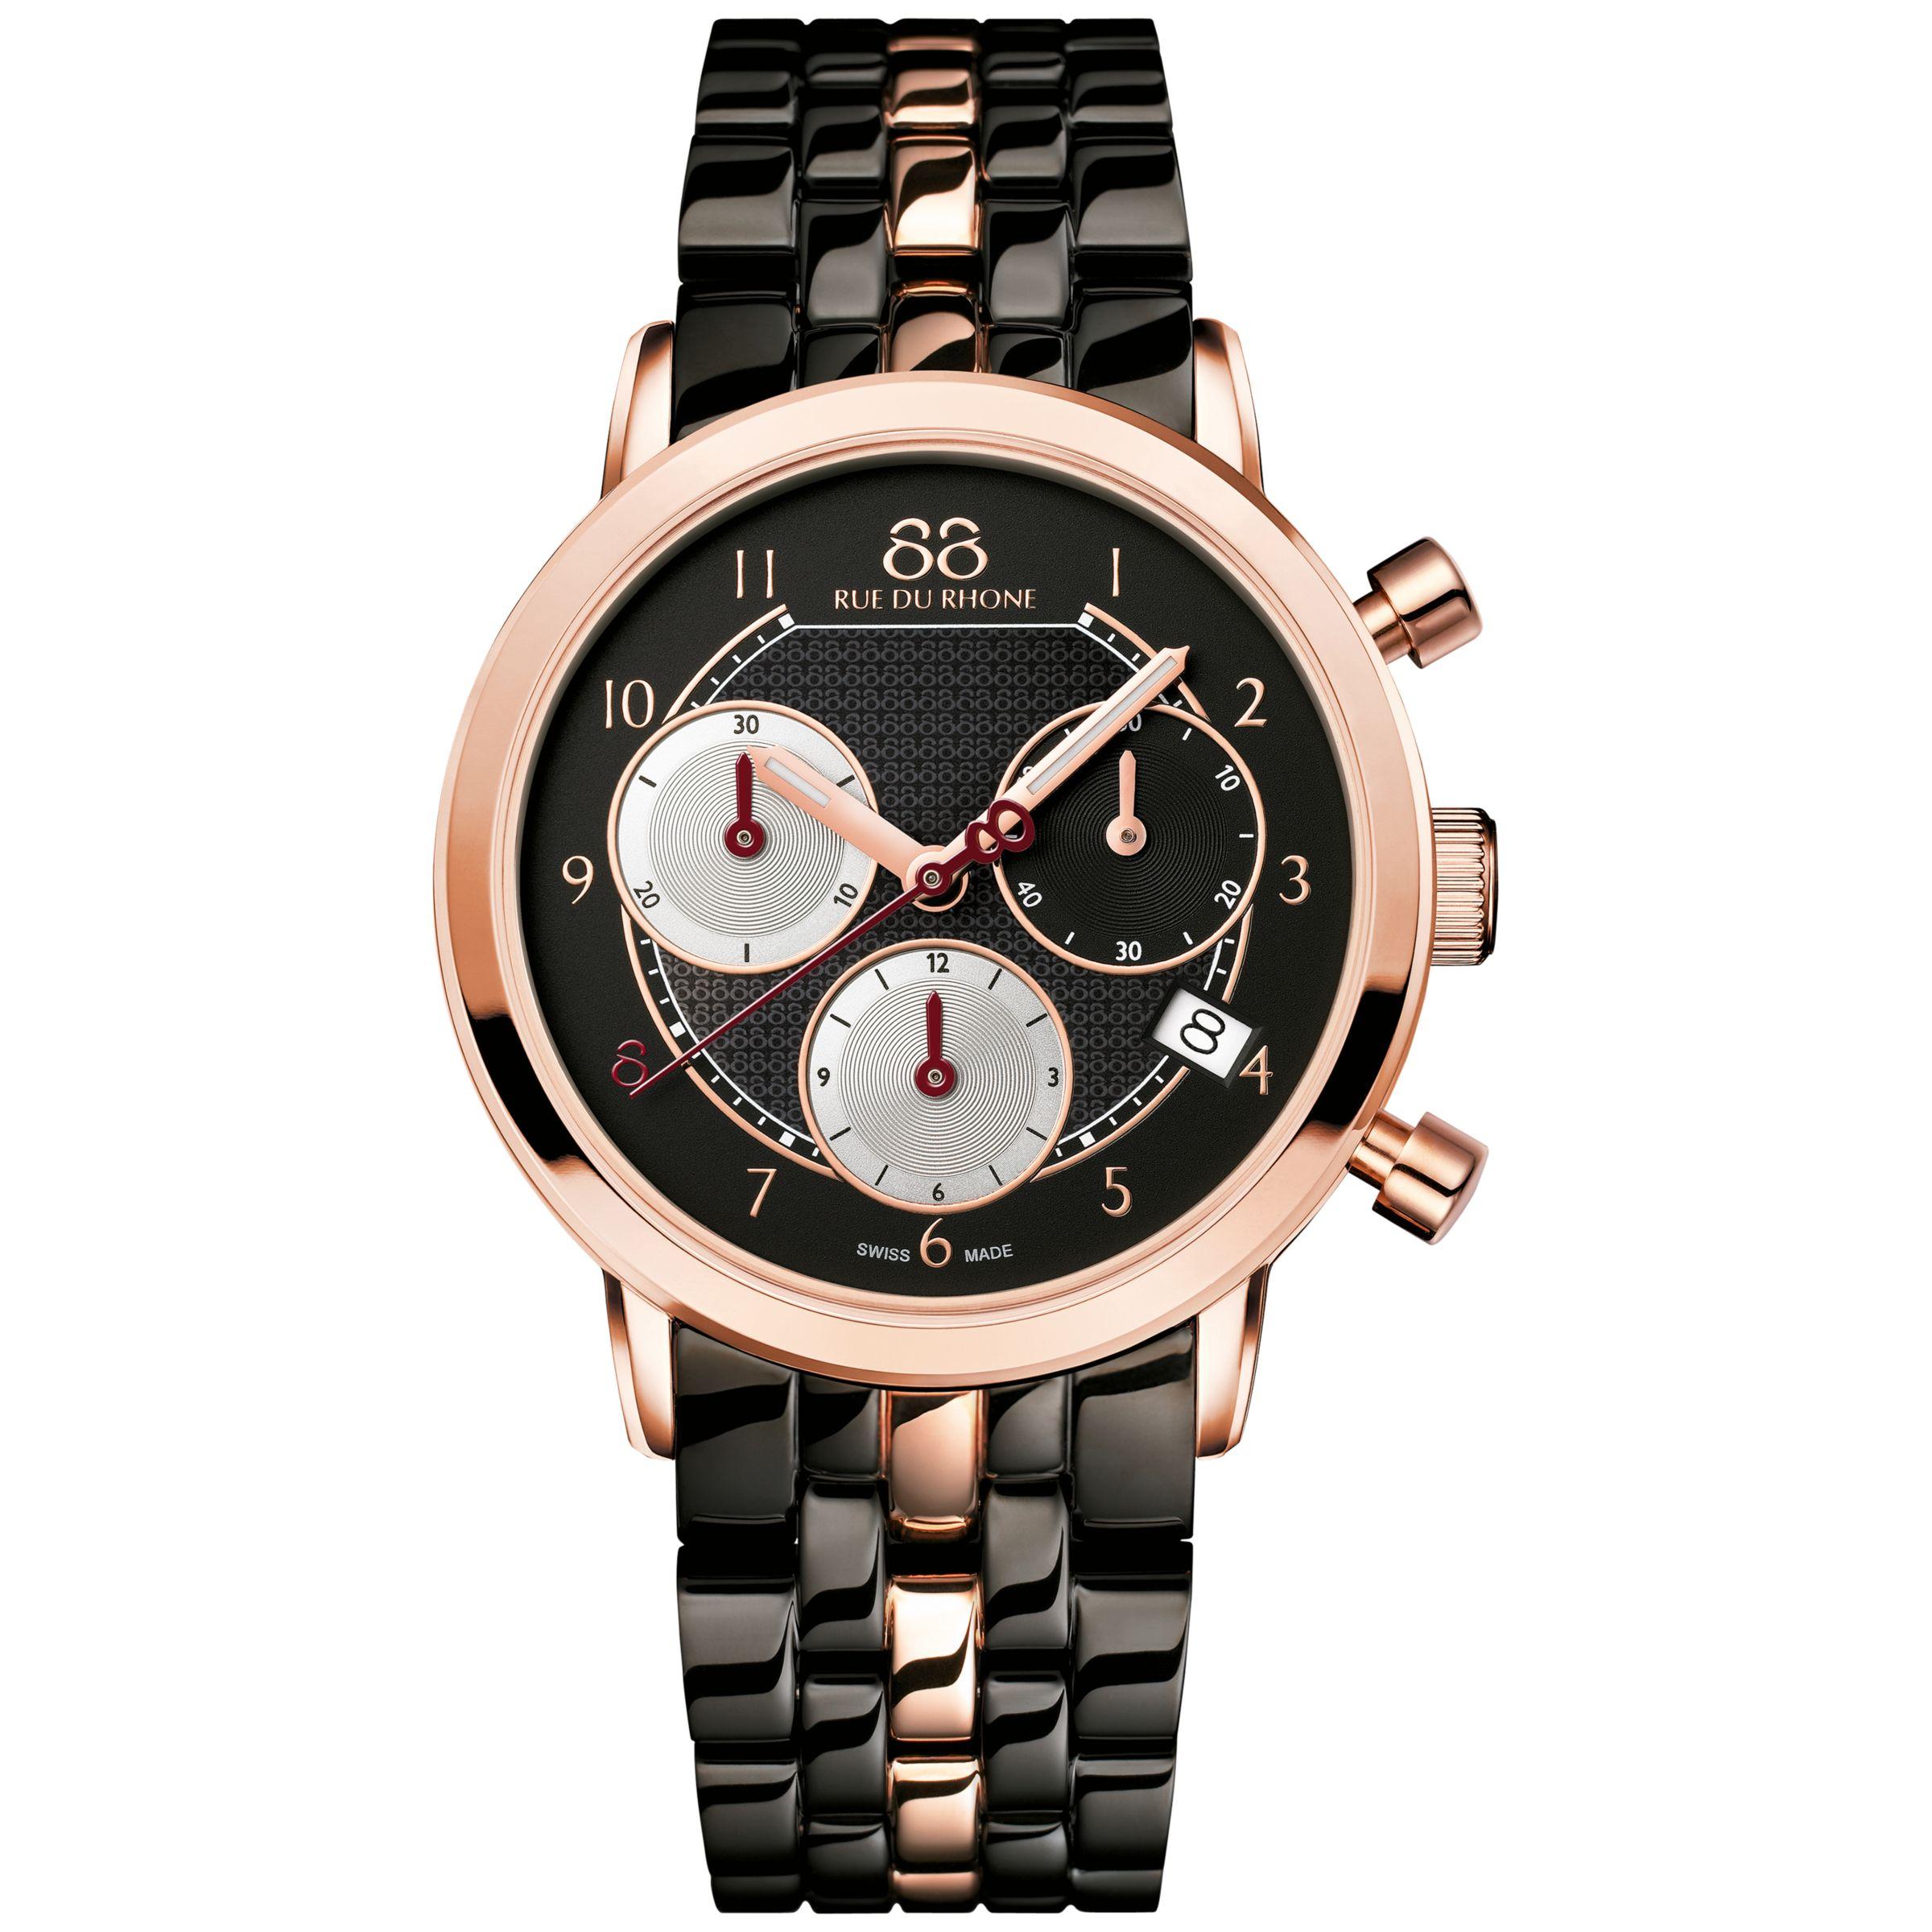 88 Rue Du Rhone 88 Rue Du Rhone 87WA143507 Women's Double 8 Origin Chronograph Date Bracelet Strap Watch, Black